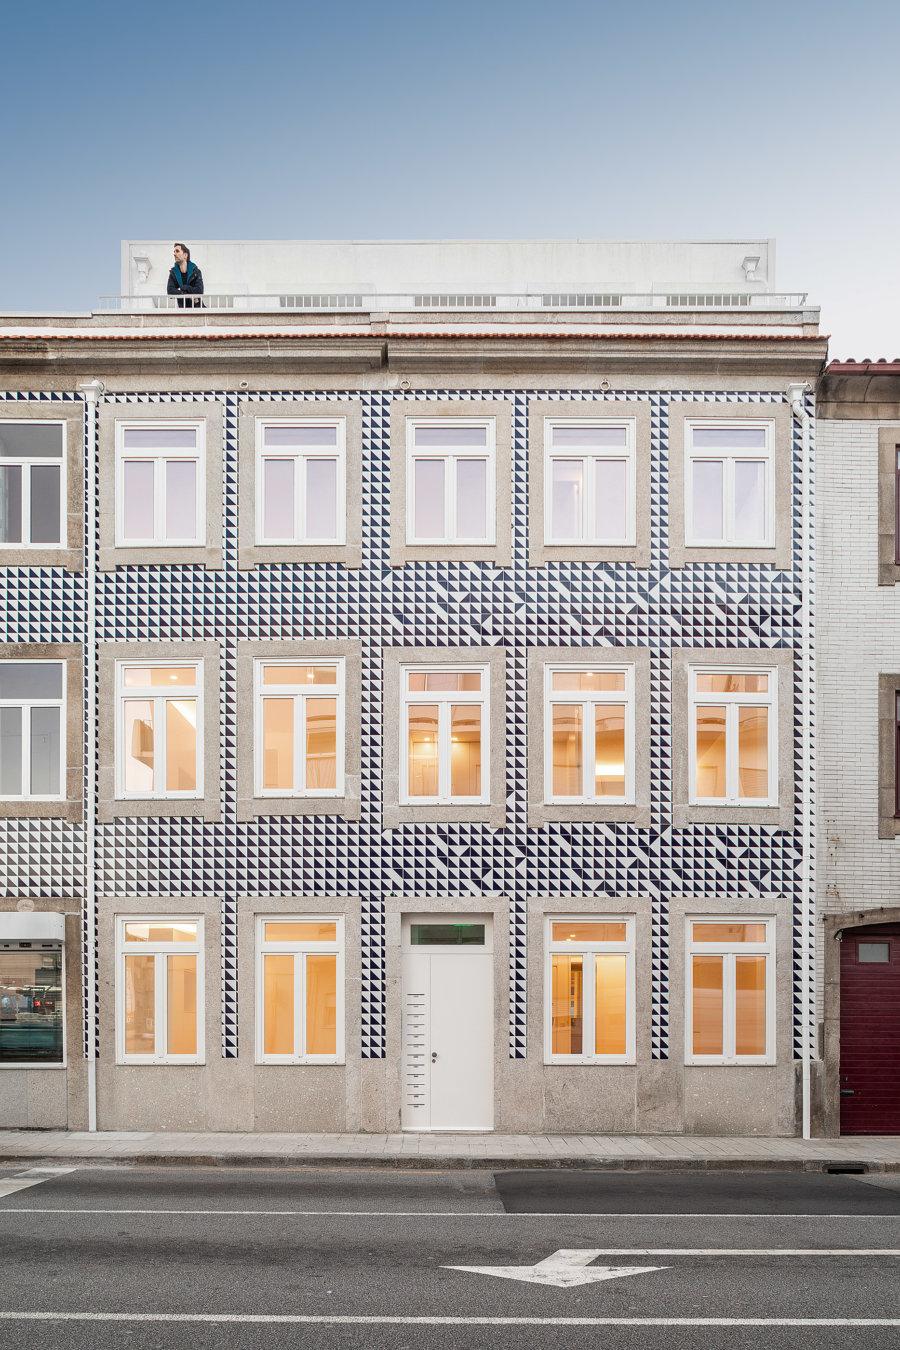 20190315 Mimool Rua Da Alegria 82 do fotografo Ivo Tavares Studio